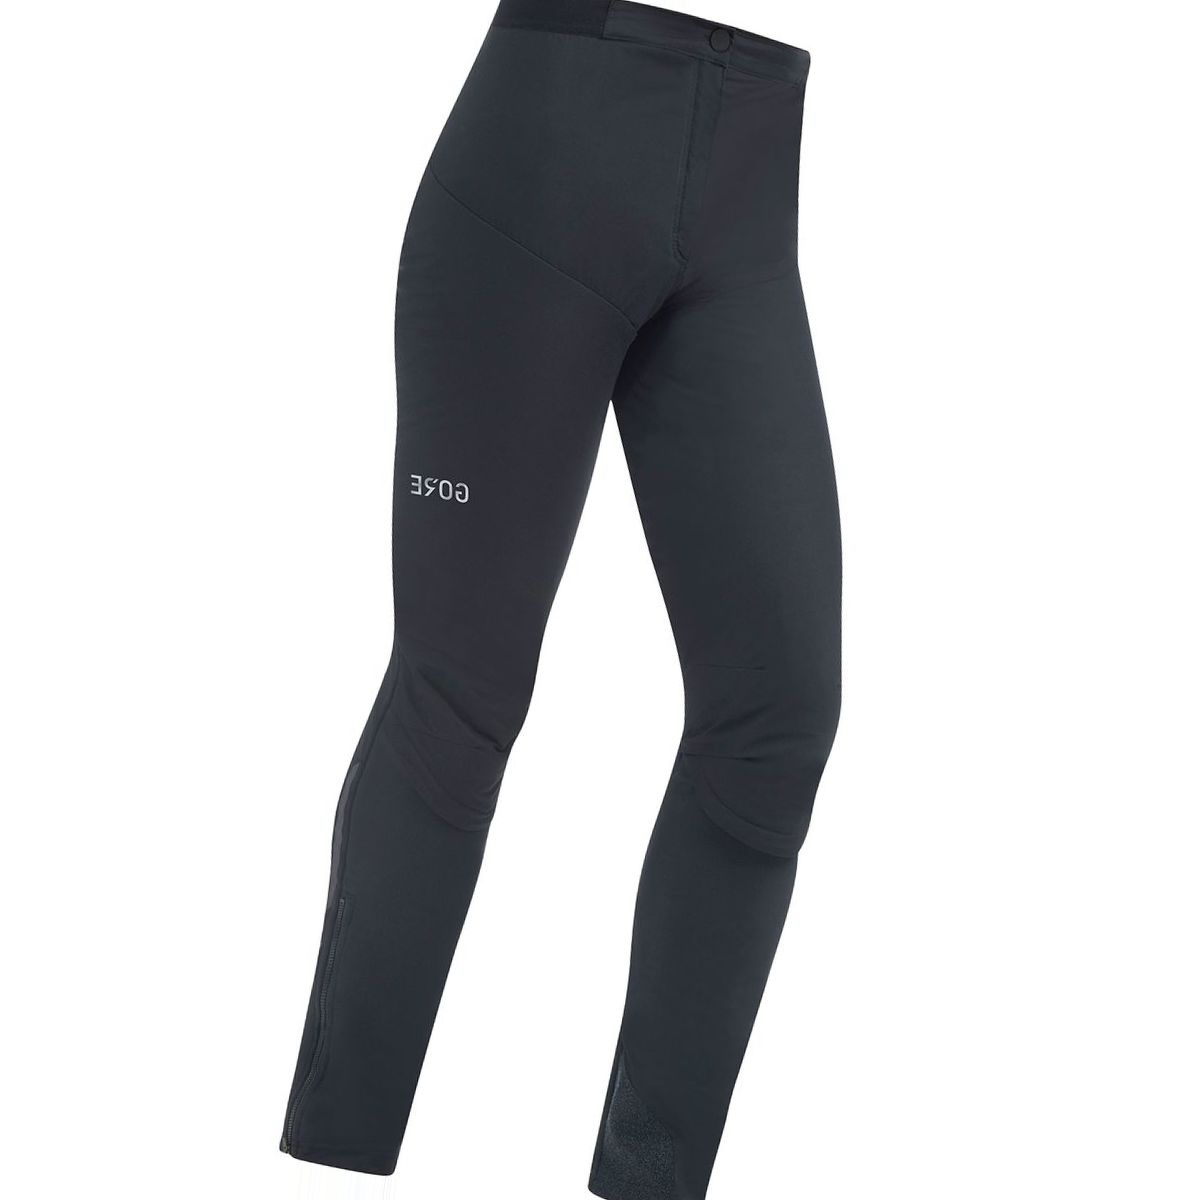 Gore Wear C7 Gore Windstopper Insulated Pant - Men's